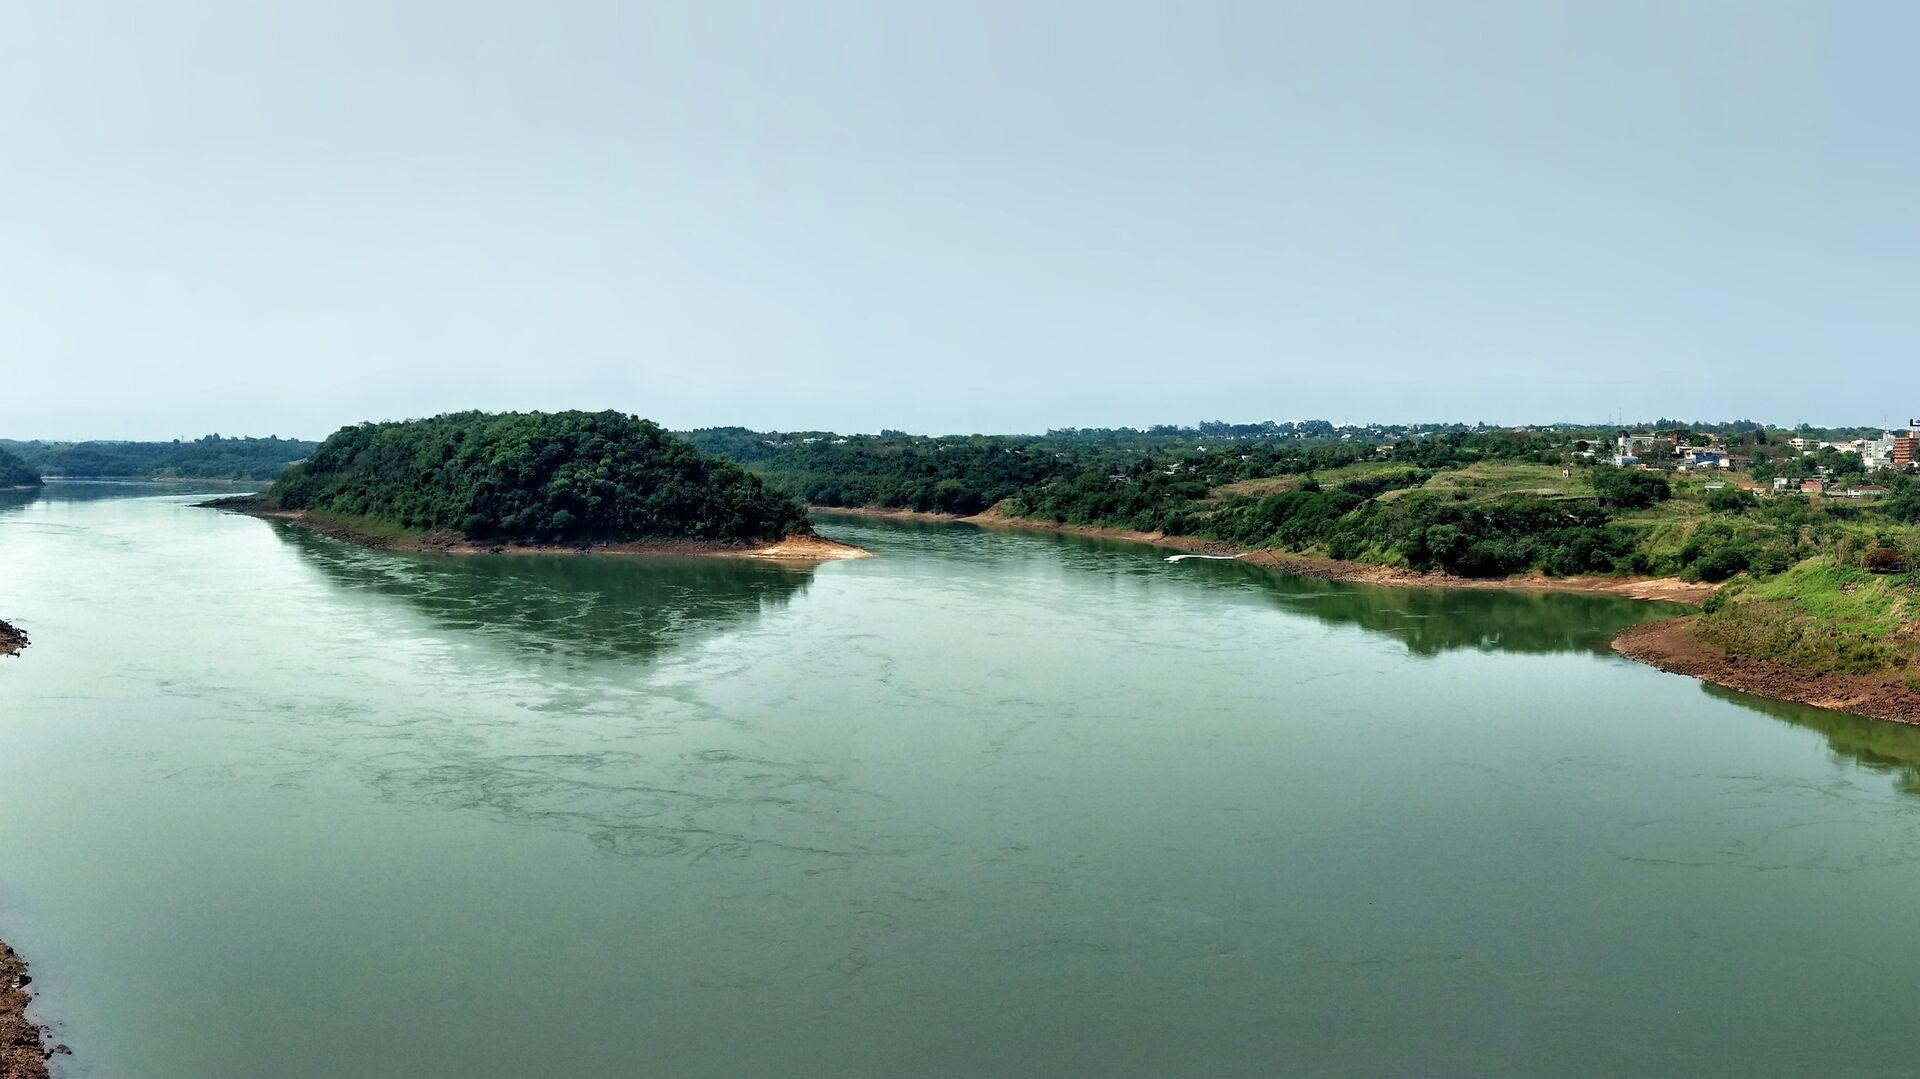 El río Paraná - Sputnik Mundo, 1920, 12.04.2021